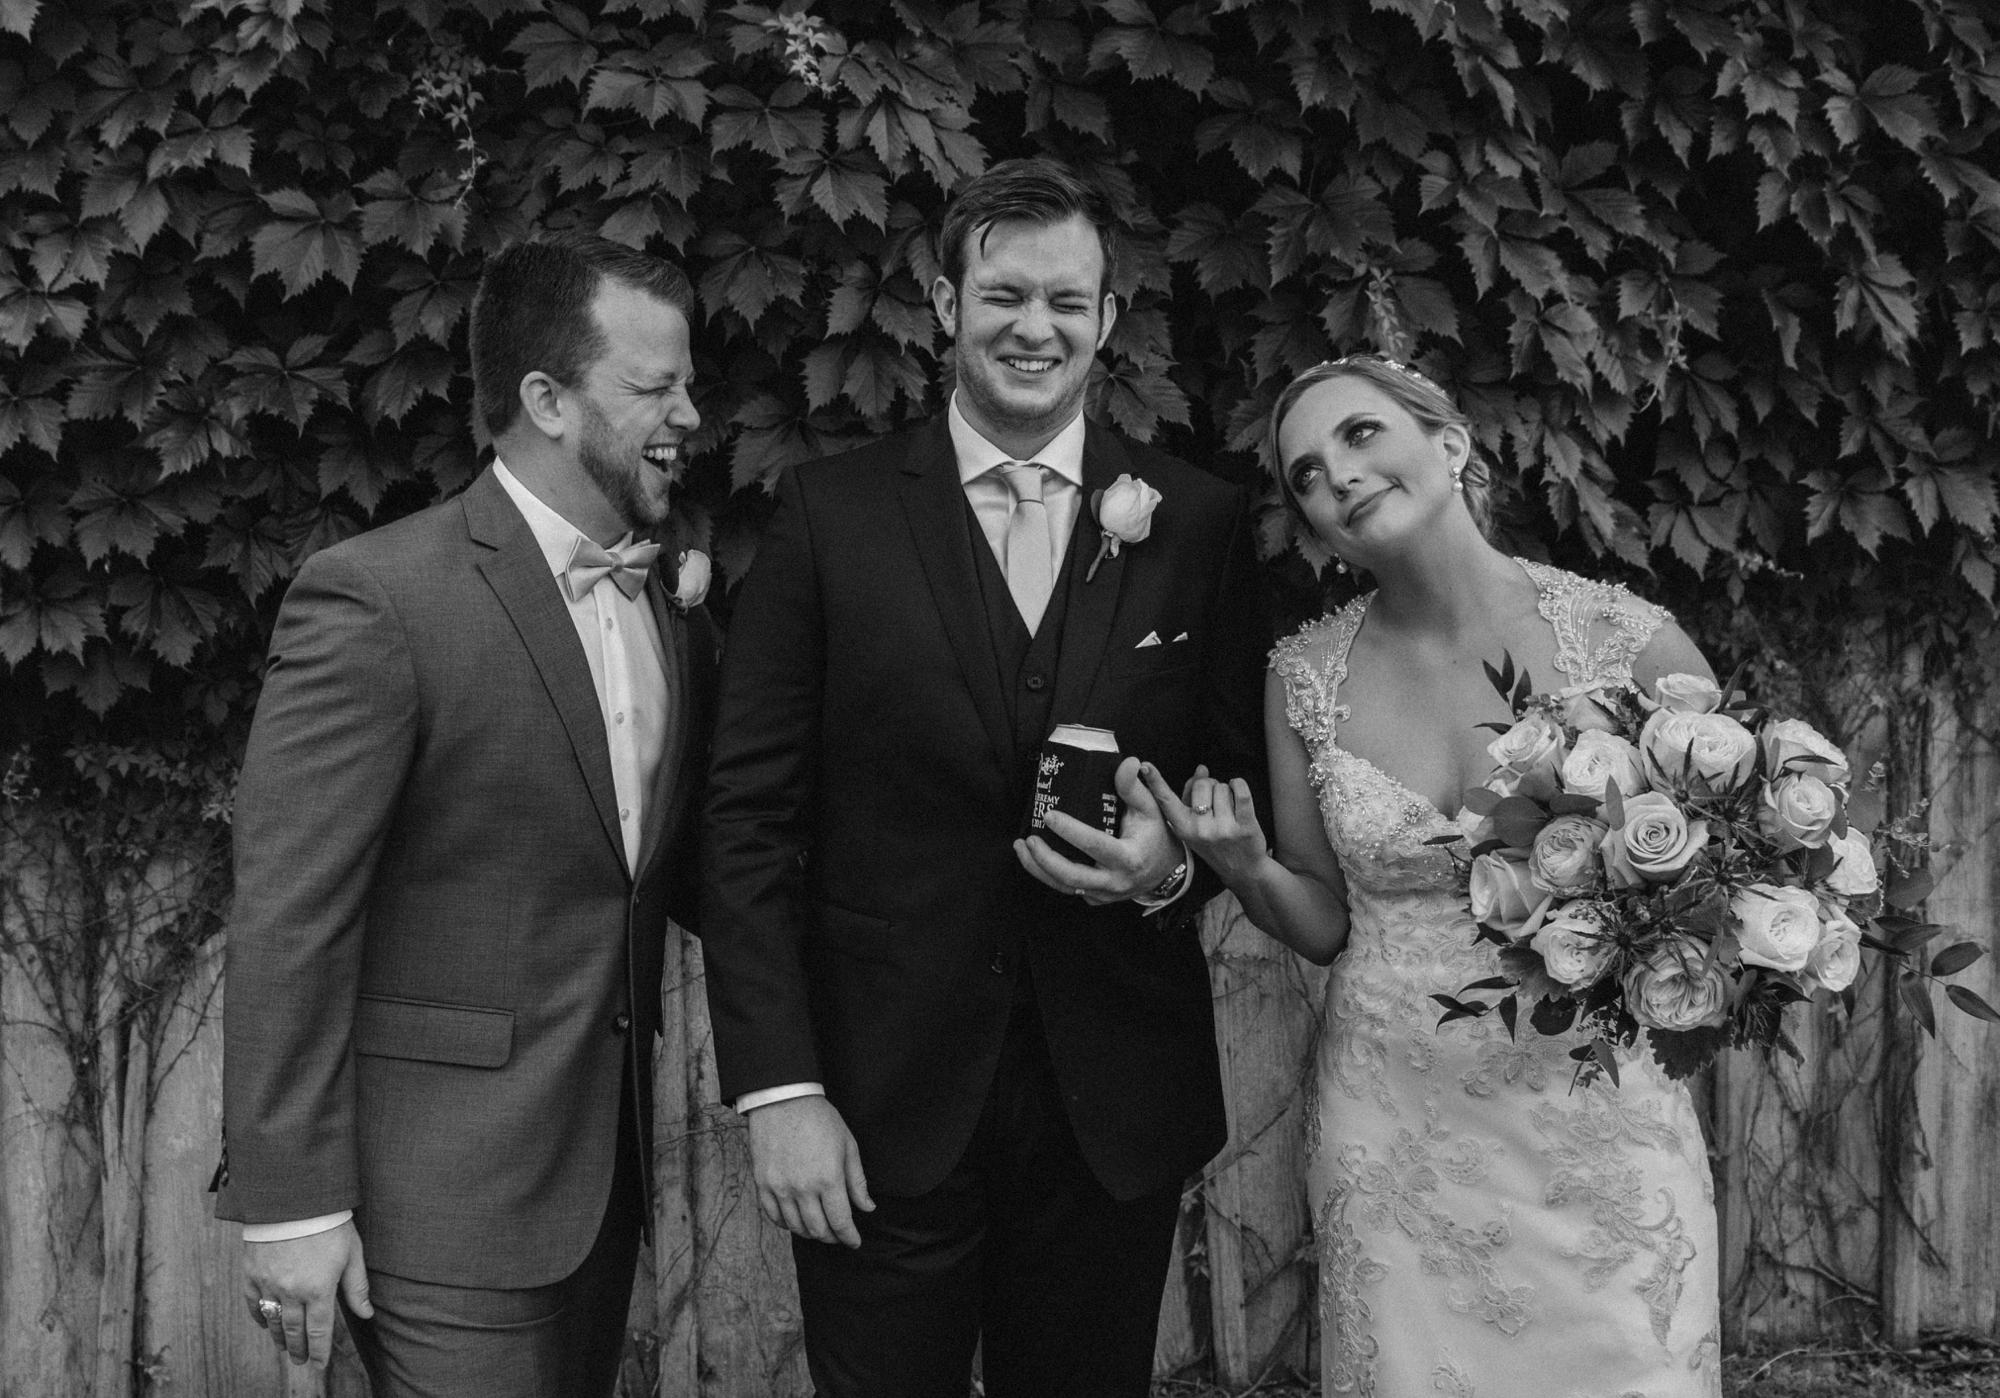 austin-texas-wedding-photography-1778-photographie-12.jpg